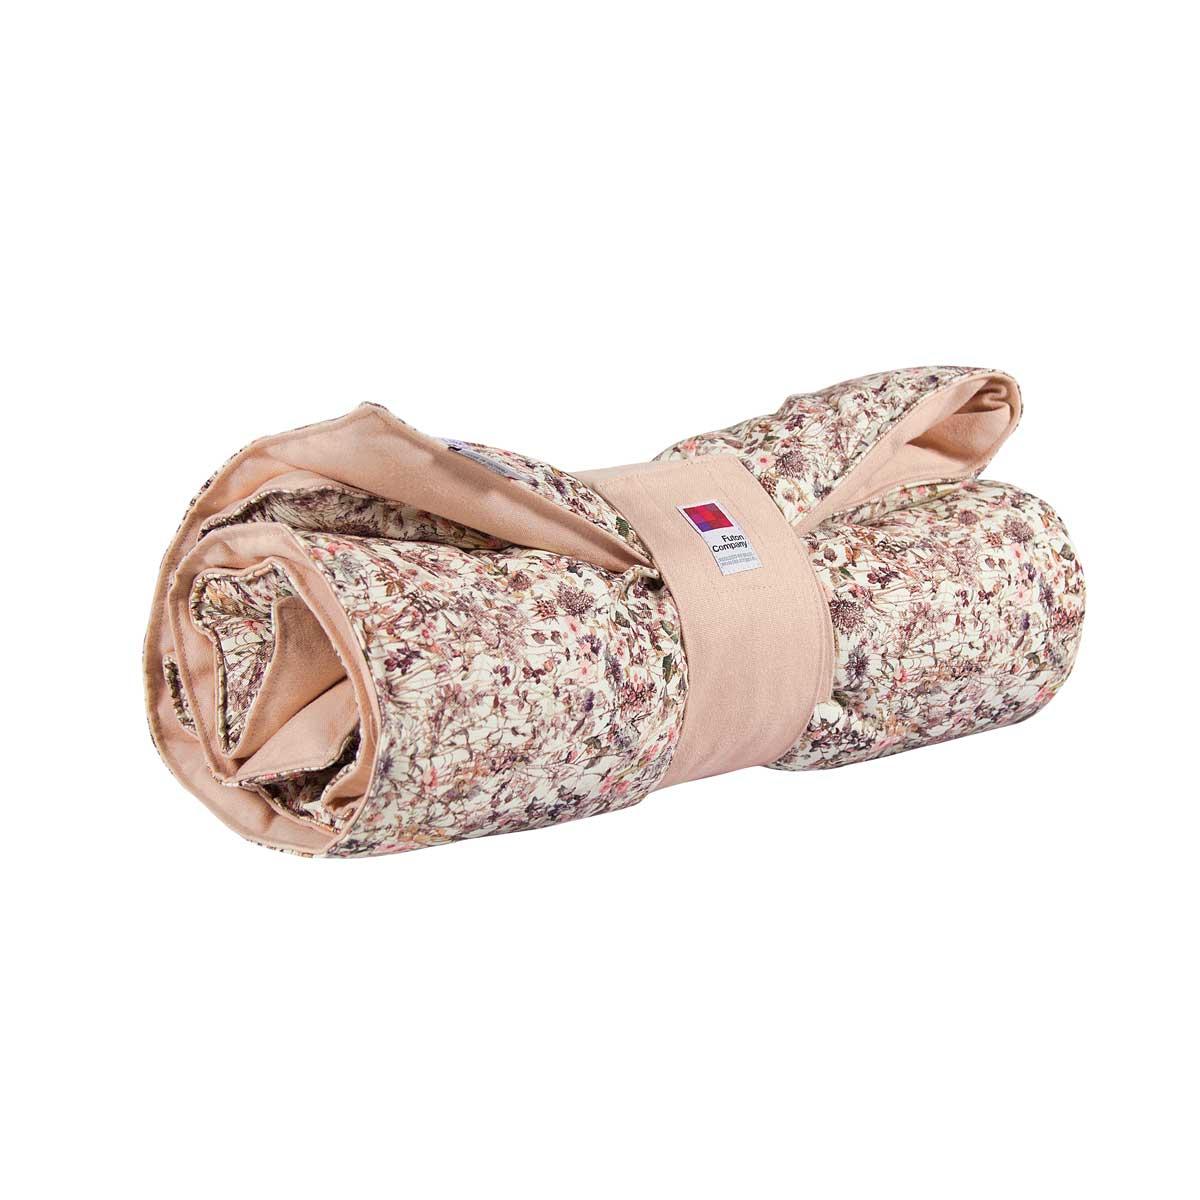 Cobertor E Playmat Quilt Bebê Liberty® Denim &Bull; Cobertor E Playmat - 1 &Bull; Deezign